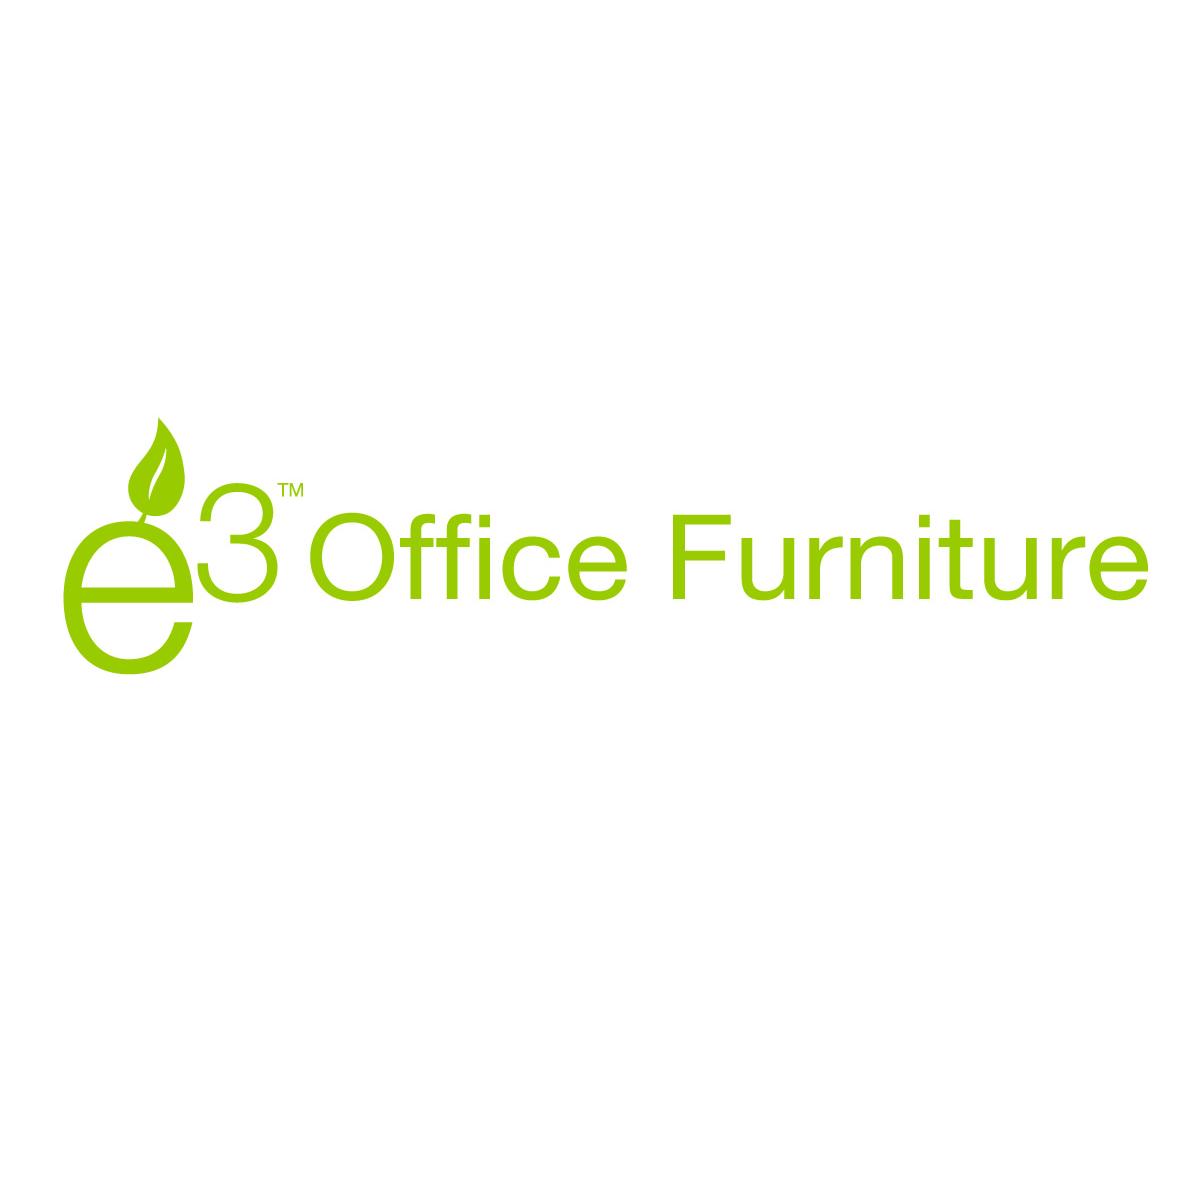 e3-office-furniture